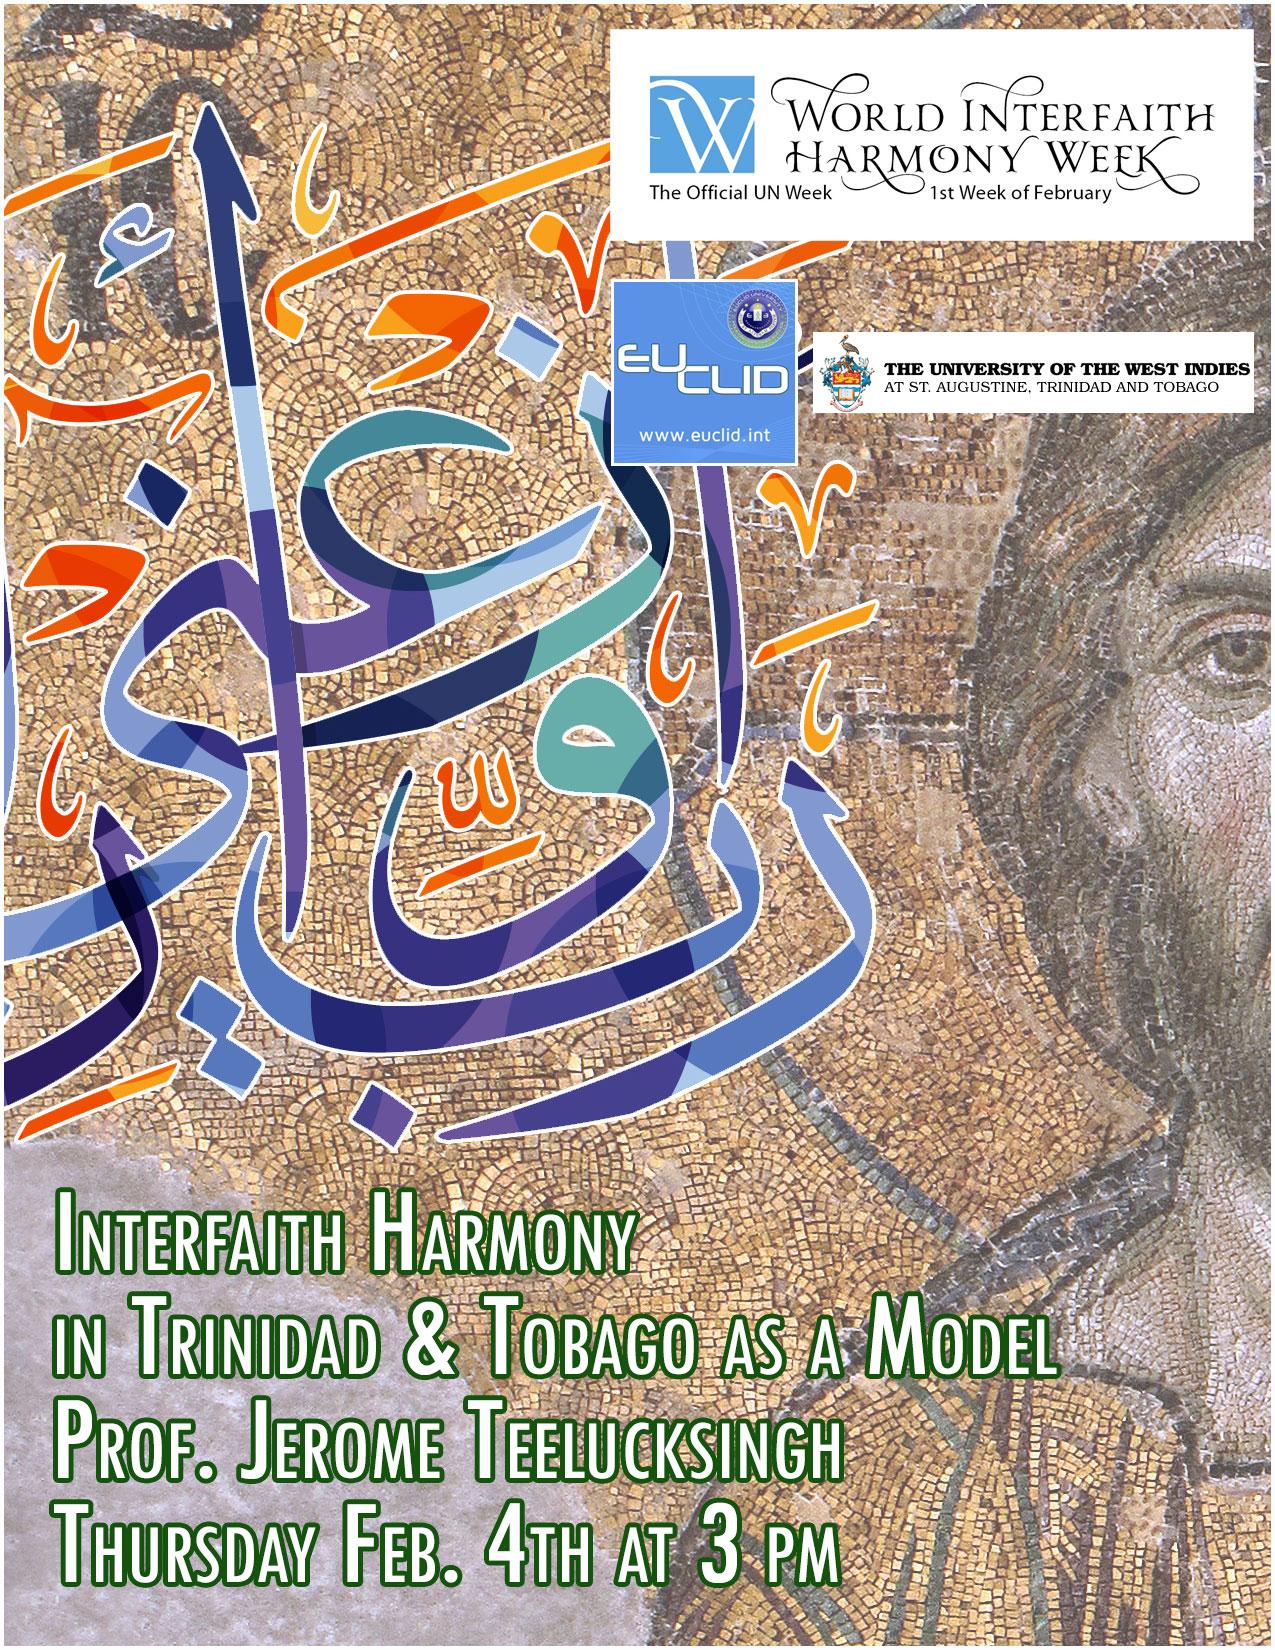 interfaith-poster-jerome.jpg